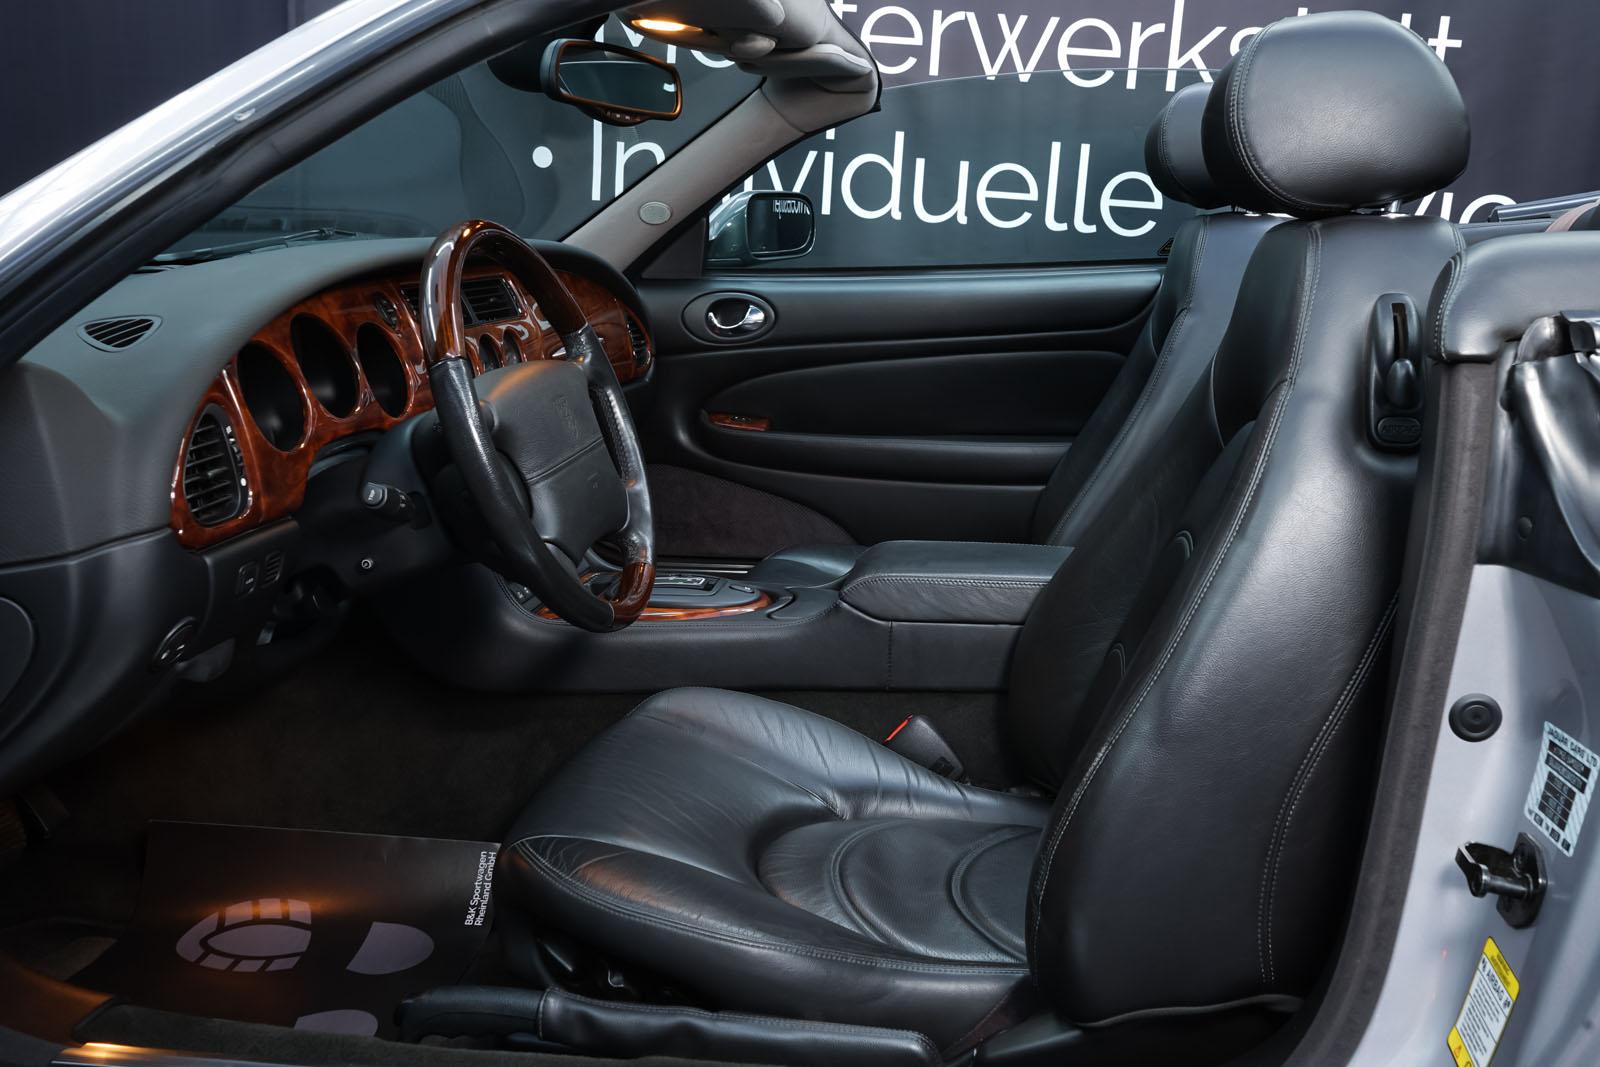 Jaguar_XK8_4.0_Silber_Schwarz_JAG-9731_8_w